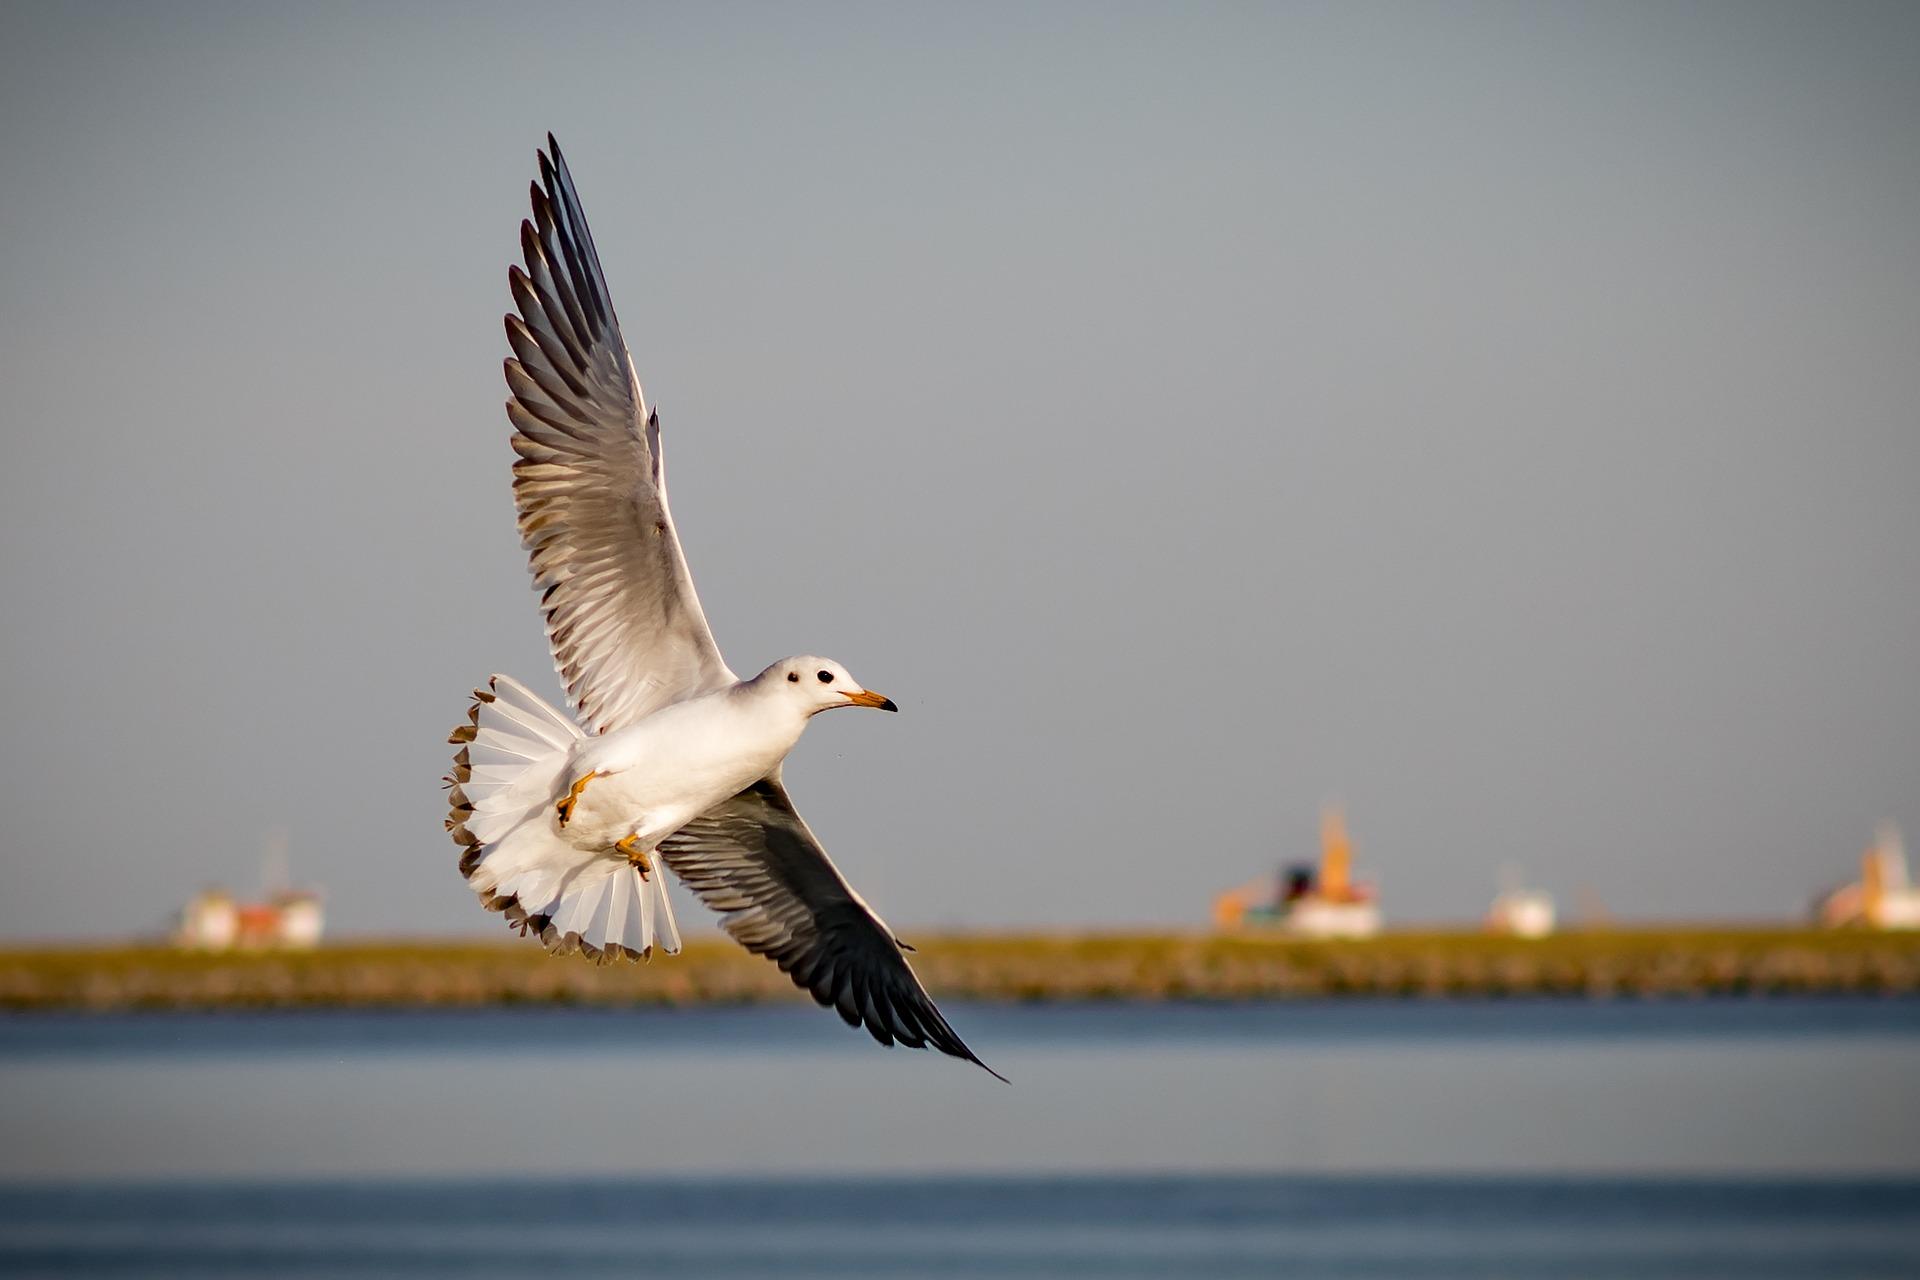 birds-3342542_1920